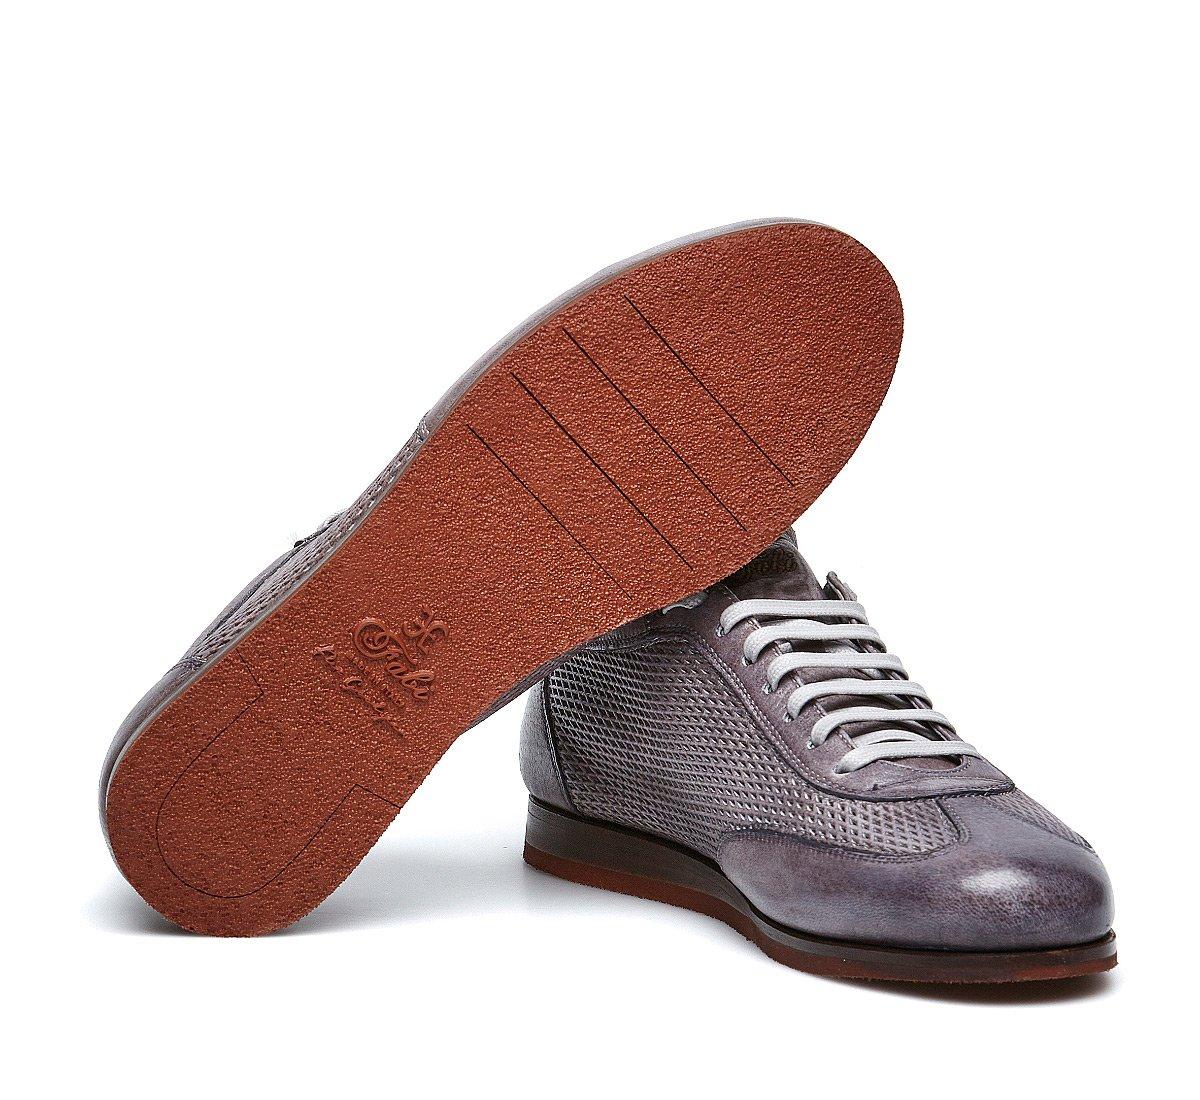 Fabi Jesse sneakers